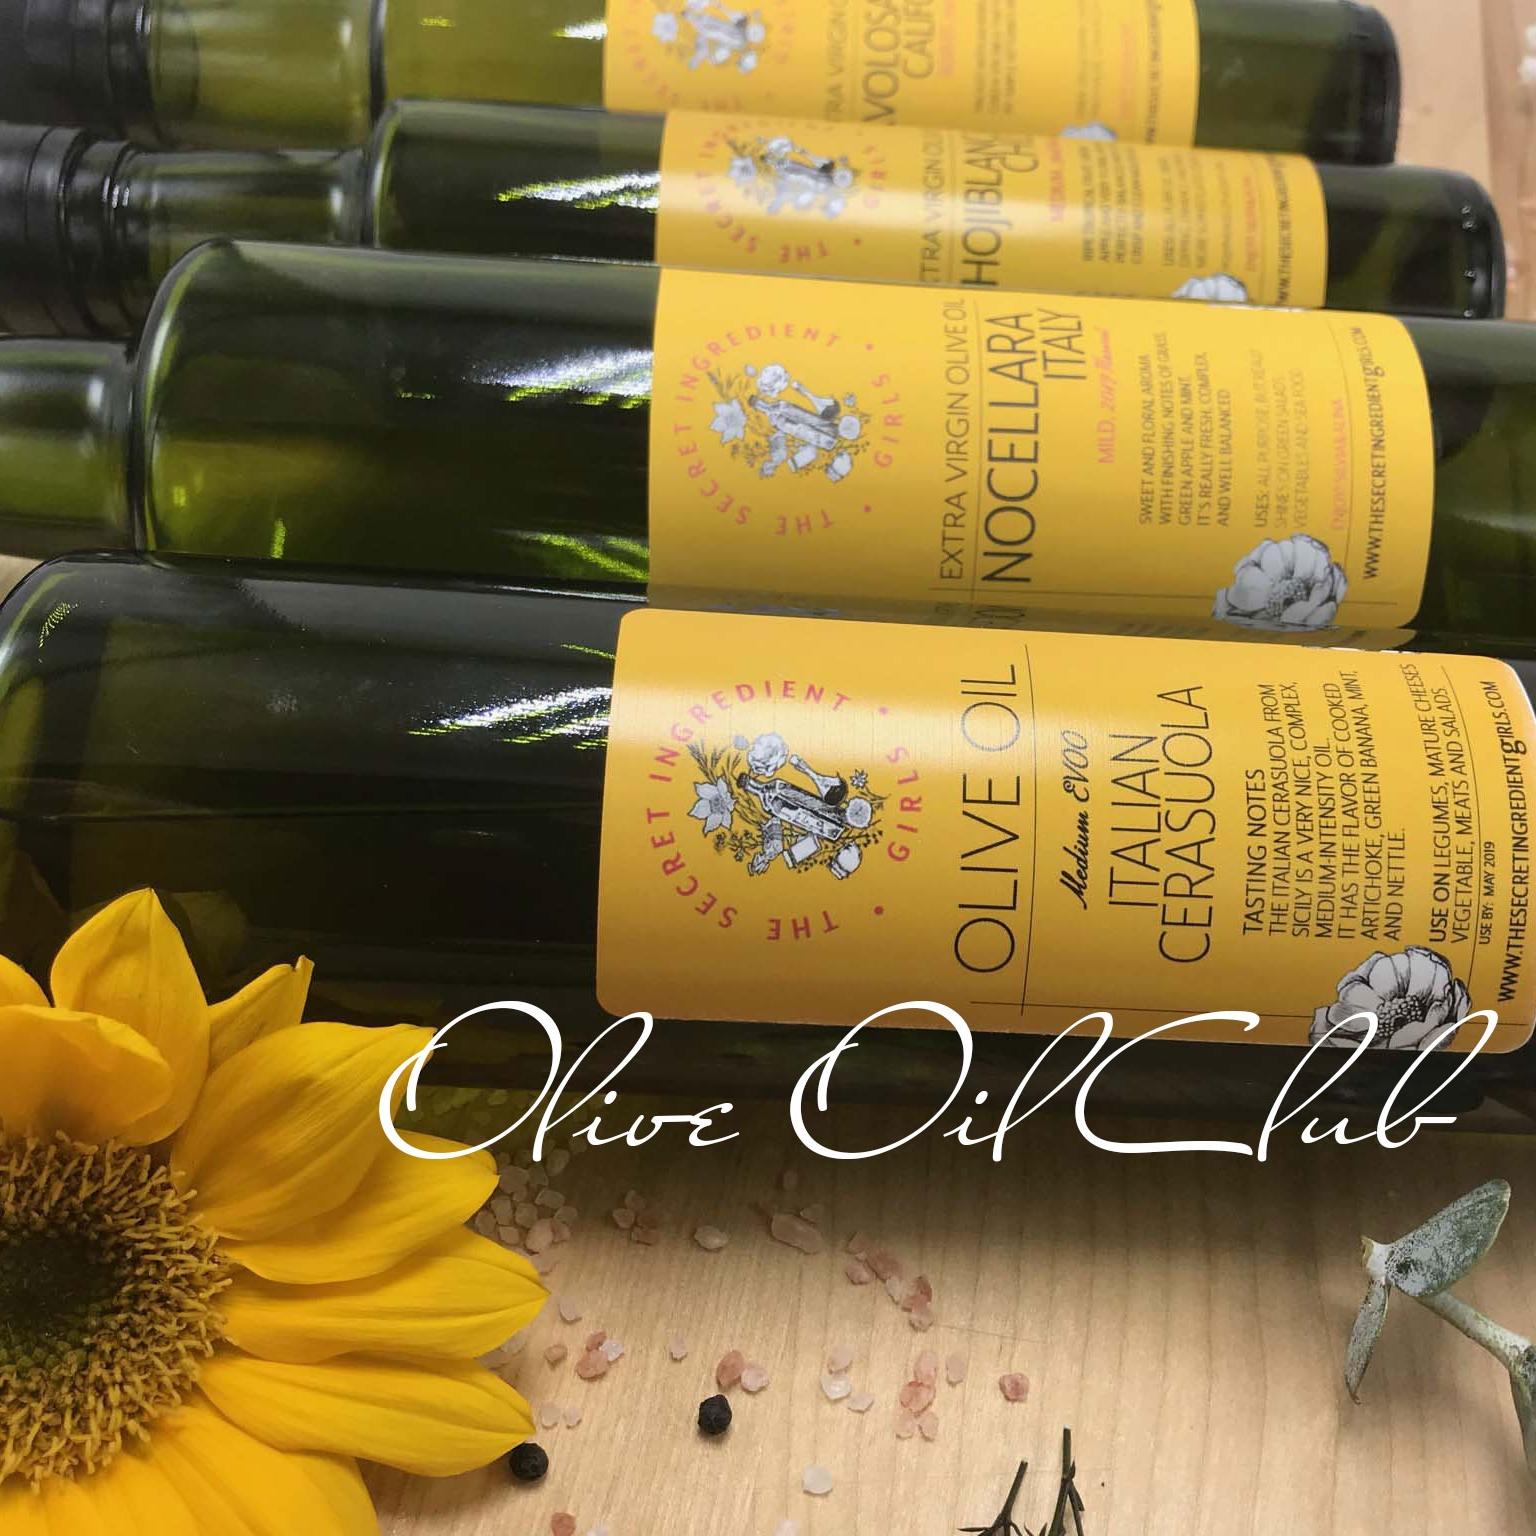 Olive-oil-wood-club.jpg